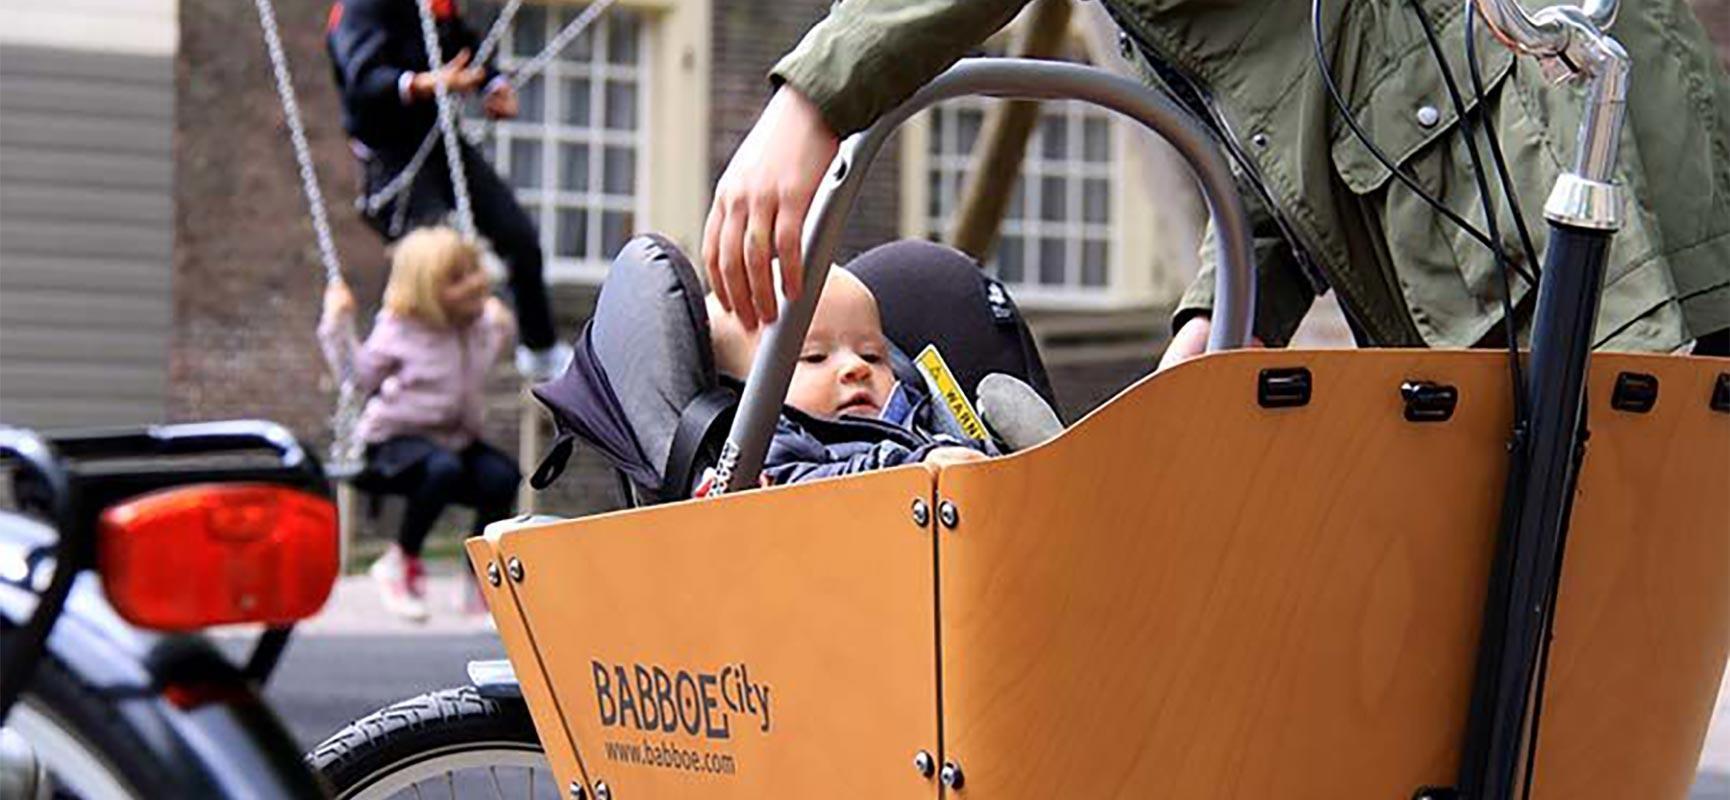 Le premier voyage de bébé en vélo cargo